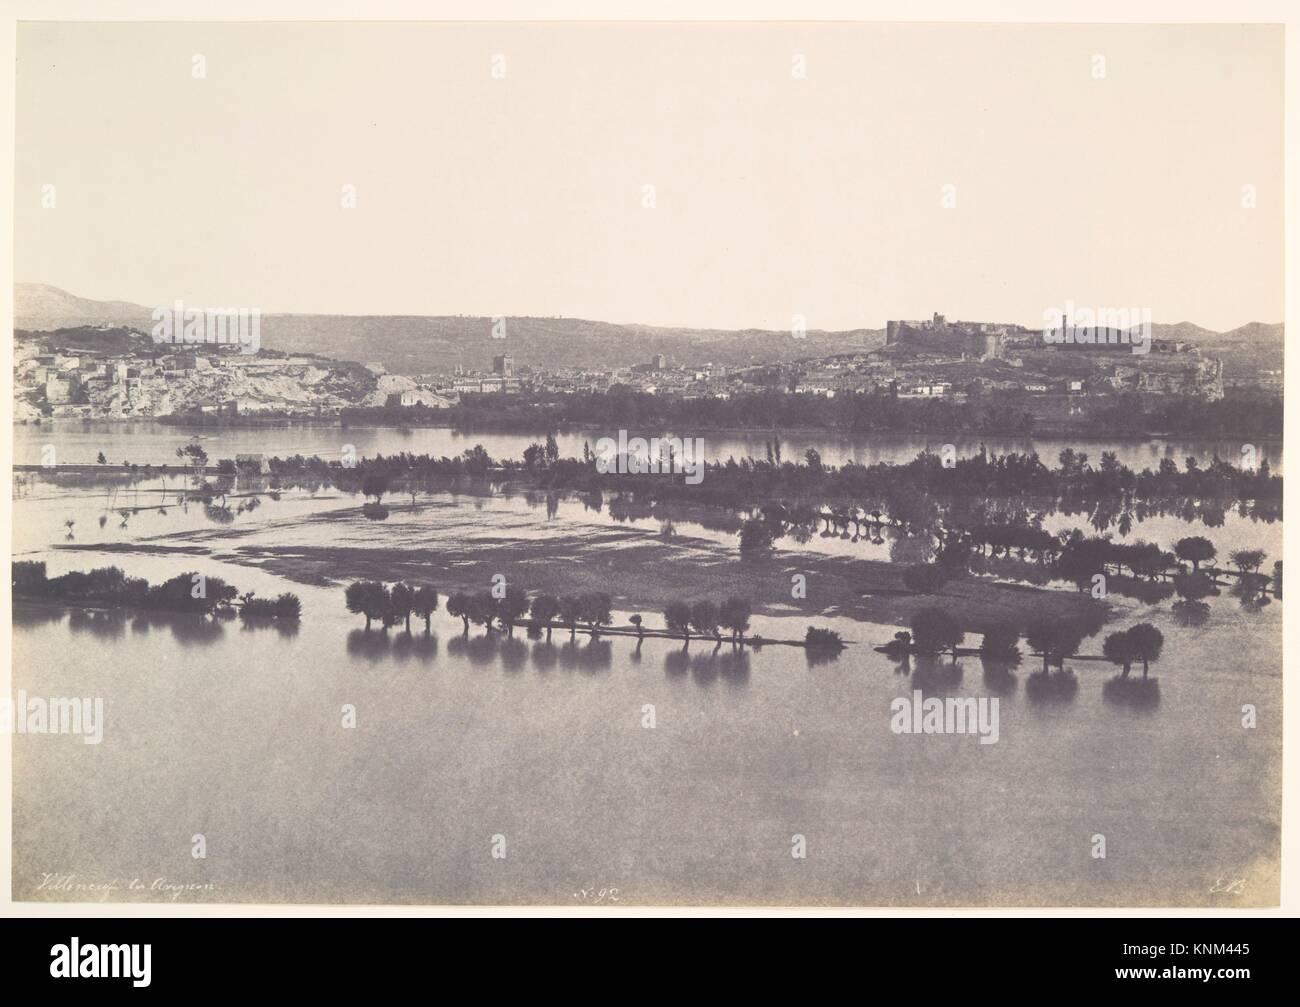 The Floods of 1856, Avignon. Artist: Édouard Baldus (French, born Prussia, 1813-1889); Date: 1856; Medium: - Stock Image